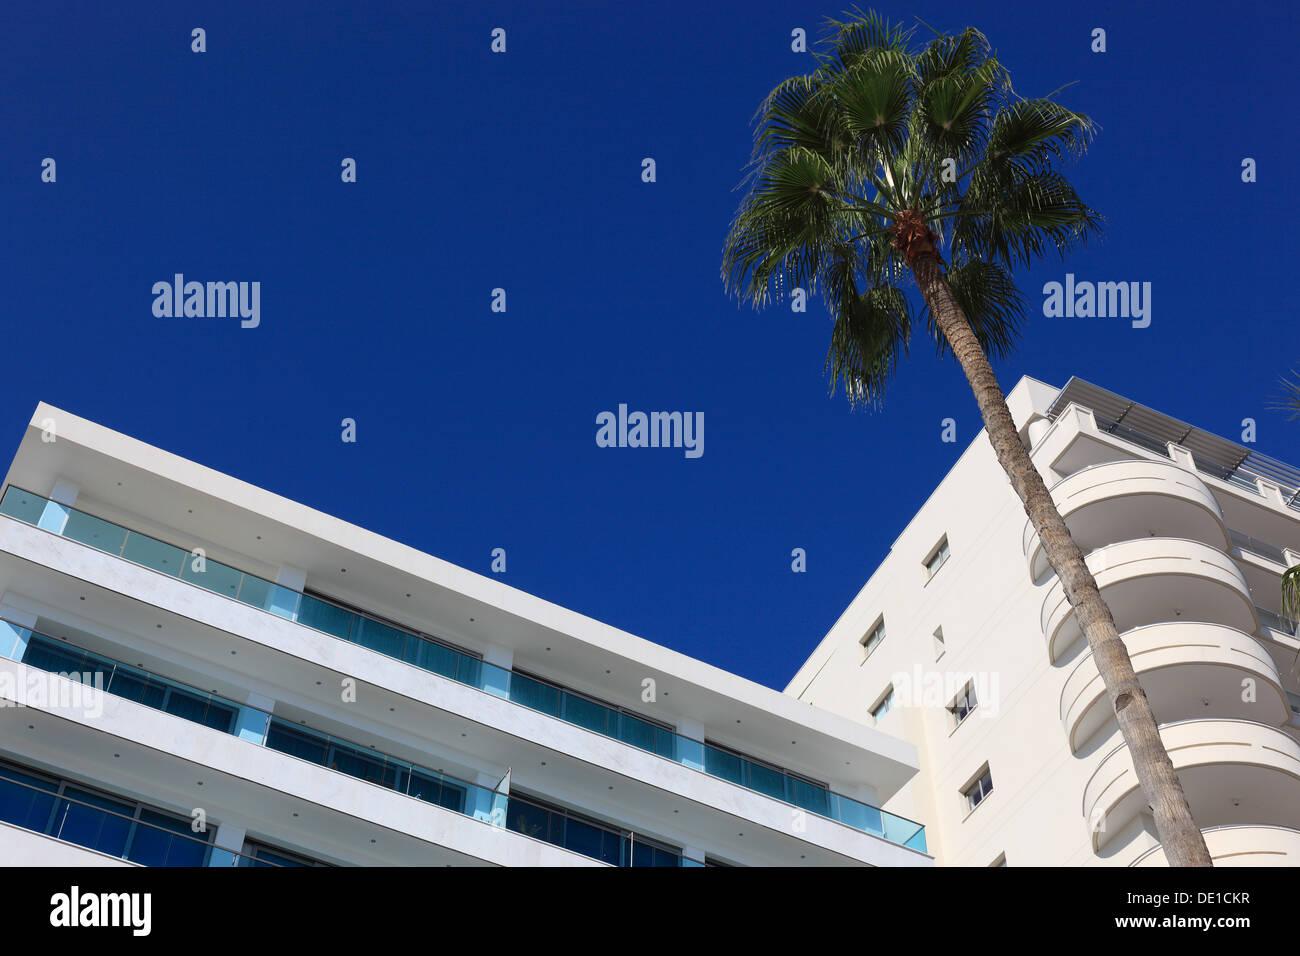 Wohngebäude, Palmen, Hotel, Larnaca, Zypern Stockbild